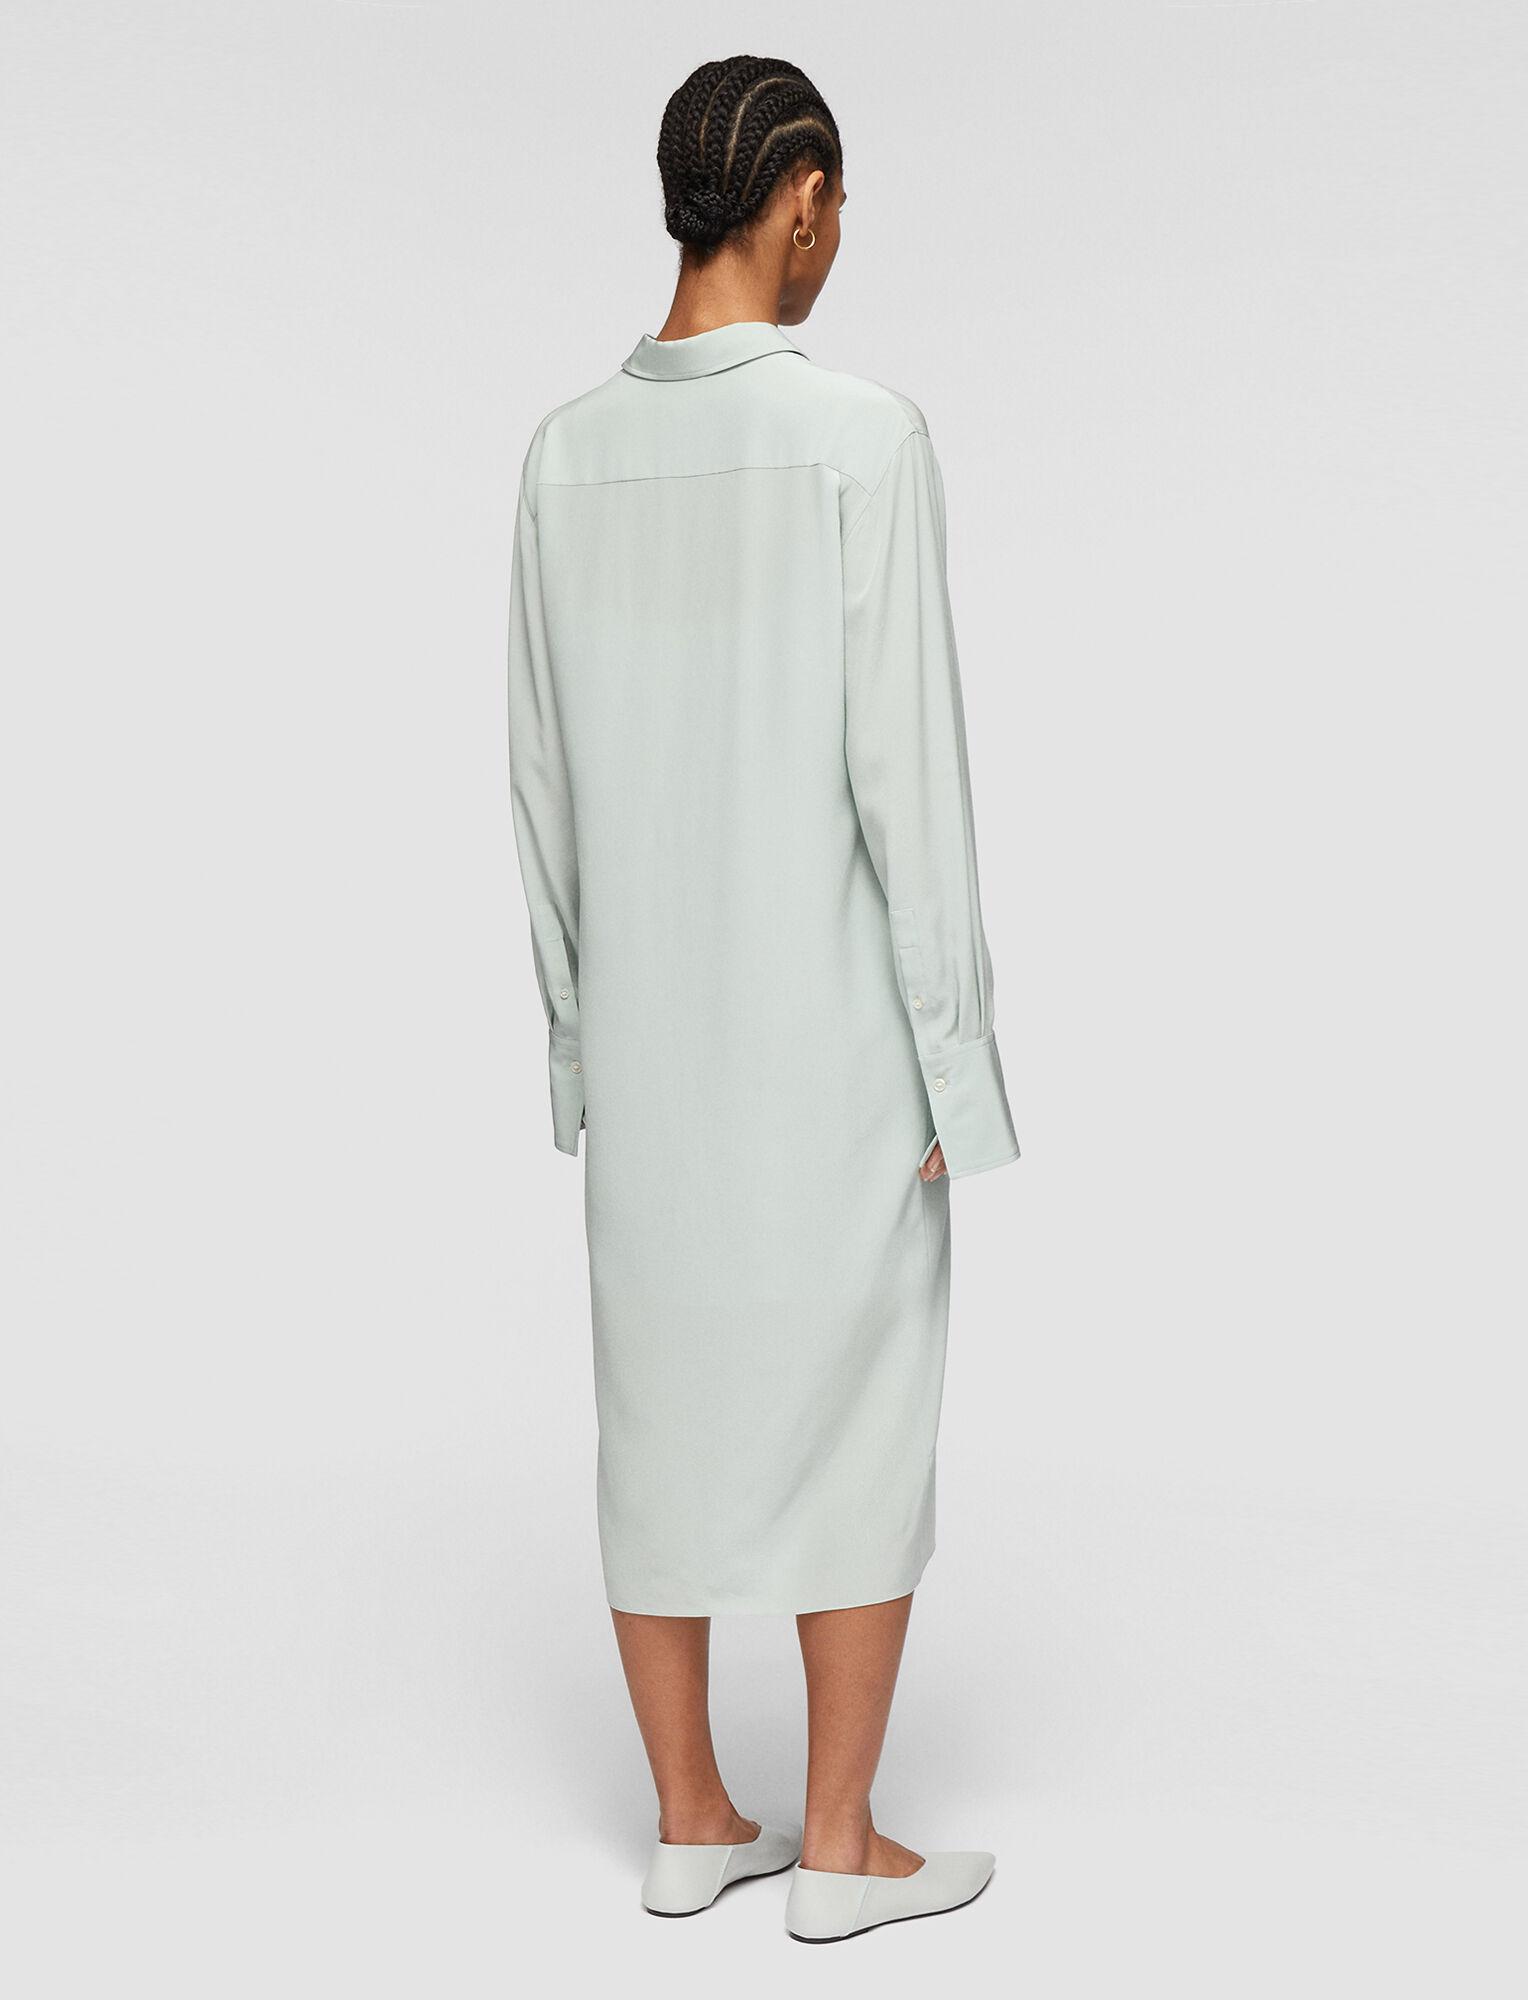 Joseph, Crepe de Soie Dold Dress, in MINT